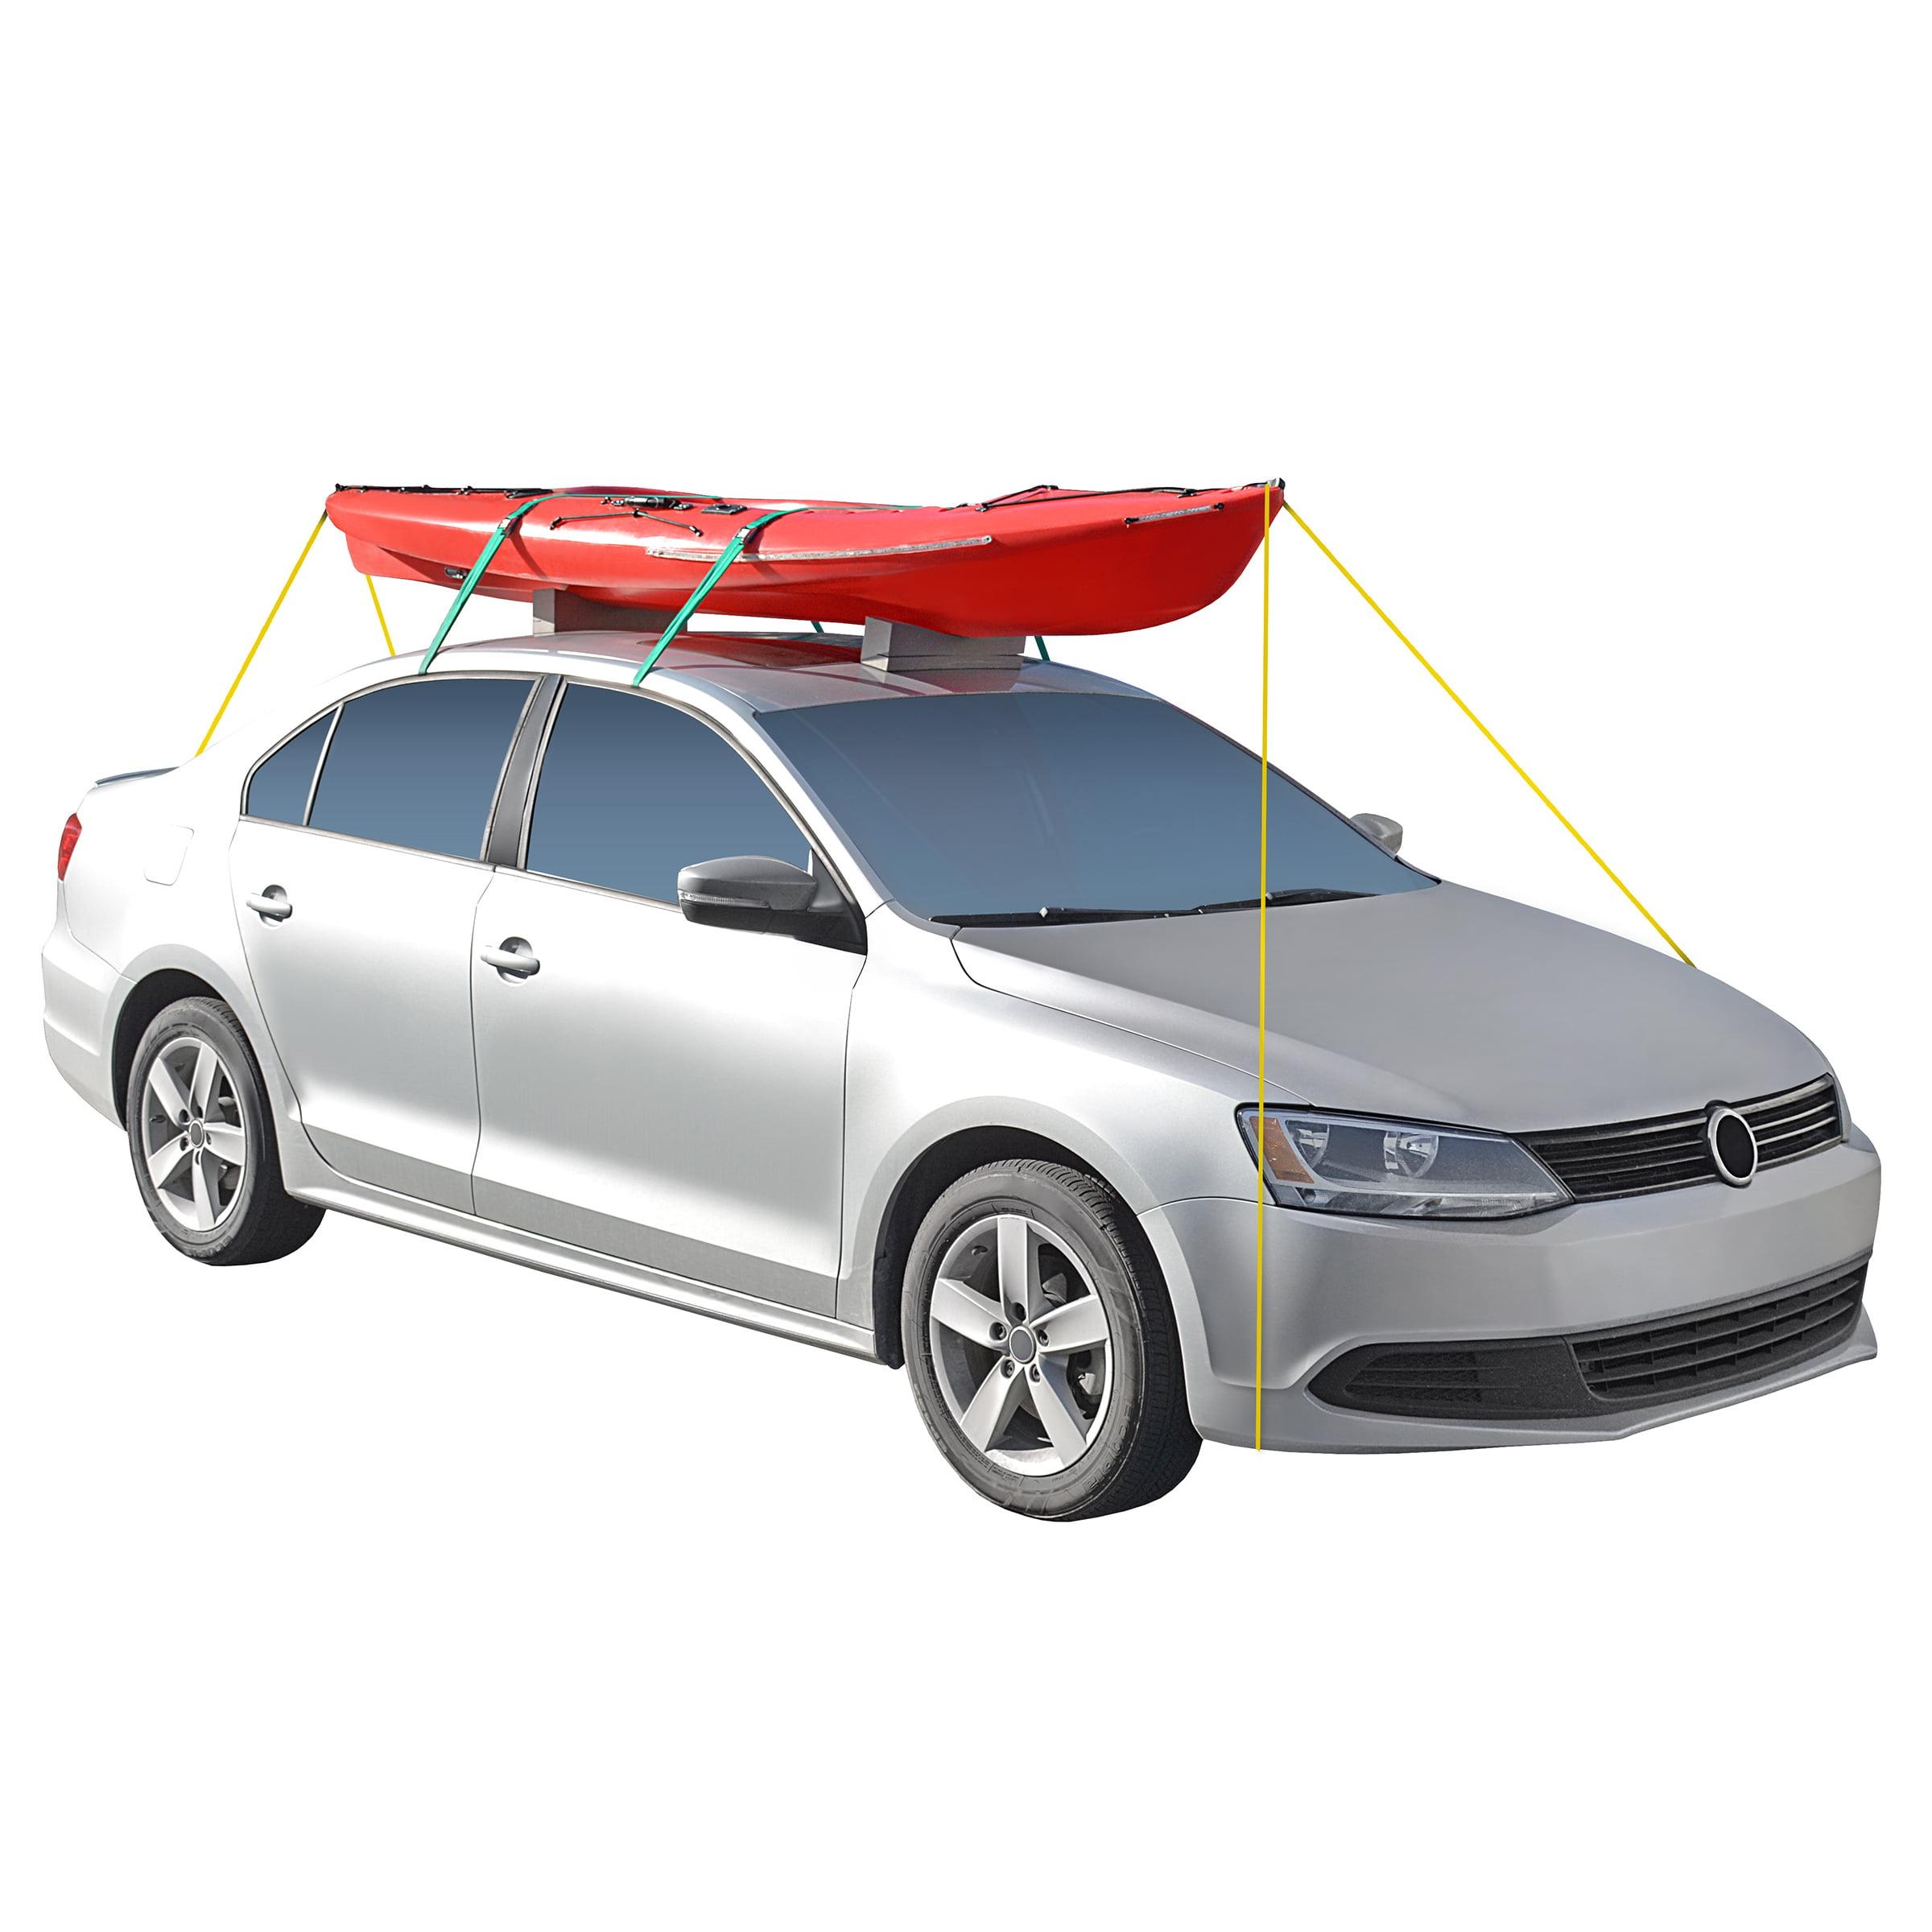 Propel Paddle Gear Universal Kayak Car Top Carrier Kit